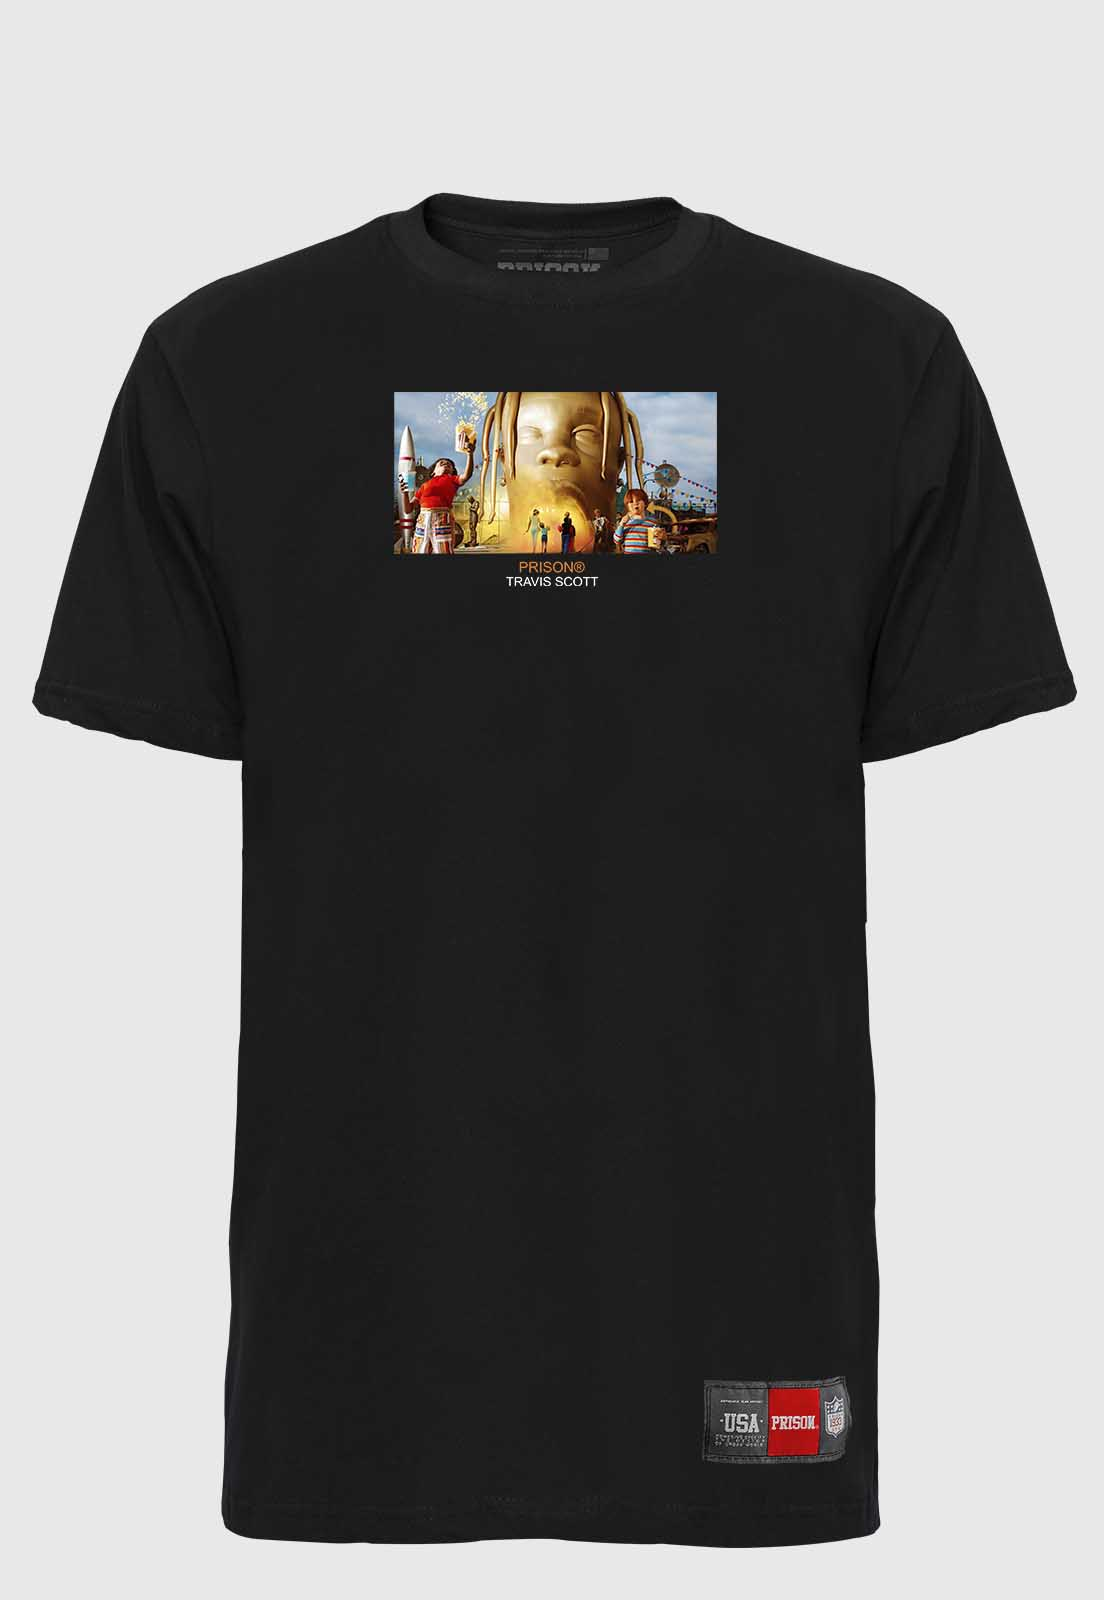 Camiseta Streetwear Prison Astro World Travis Scott